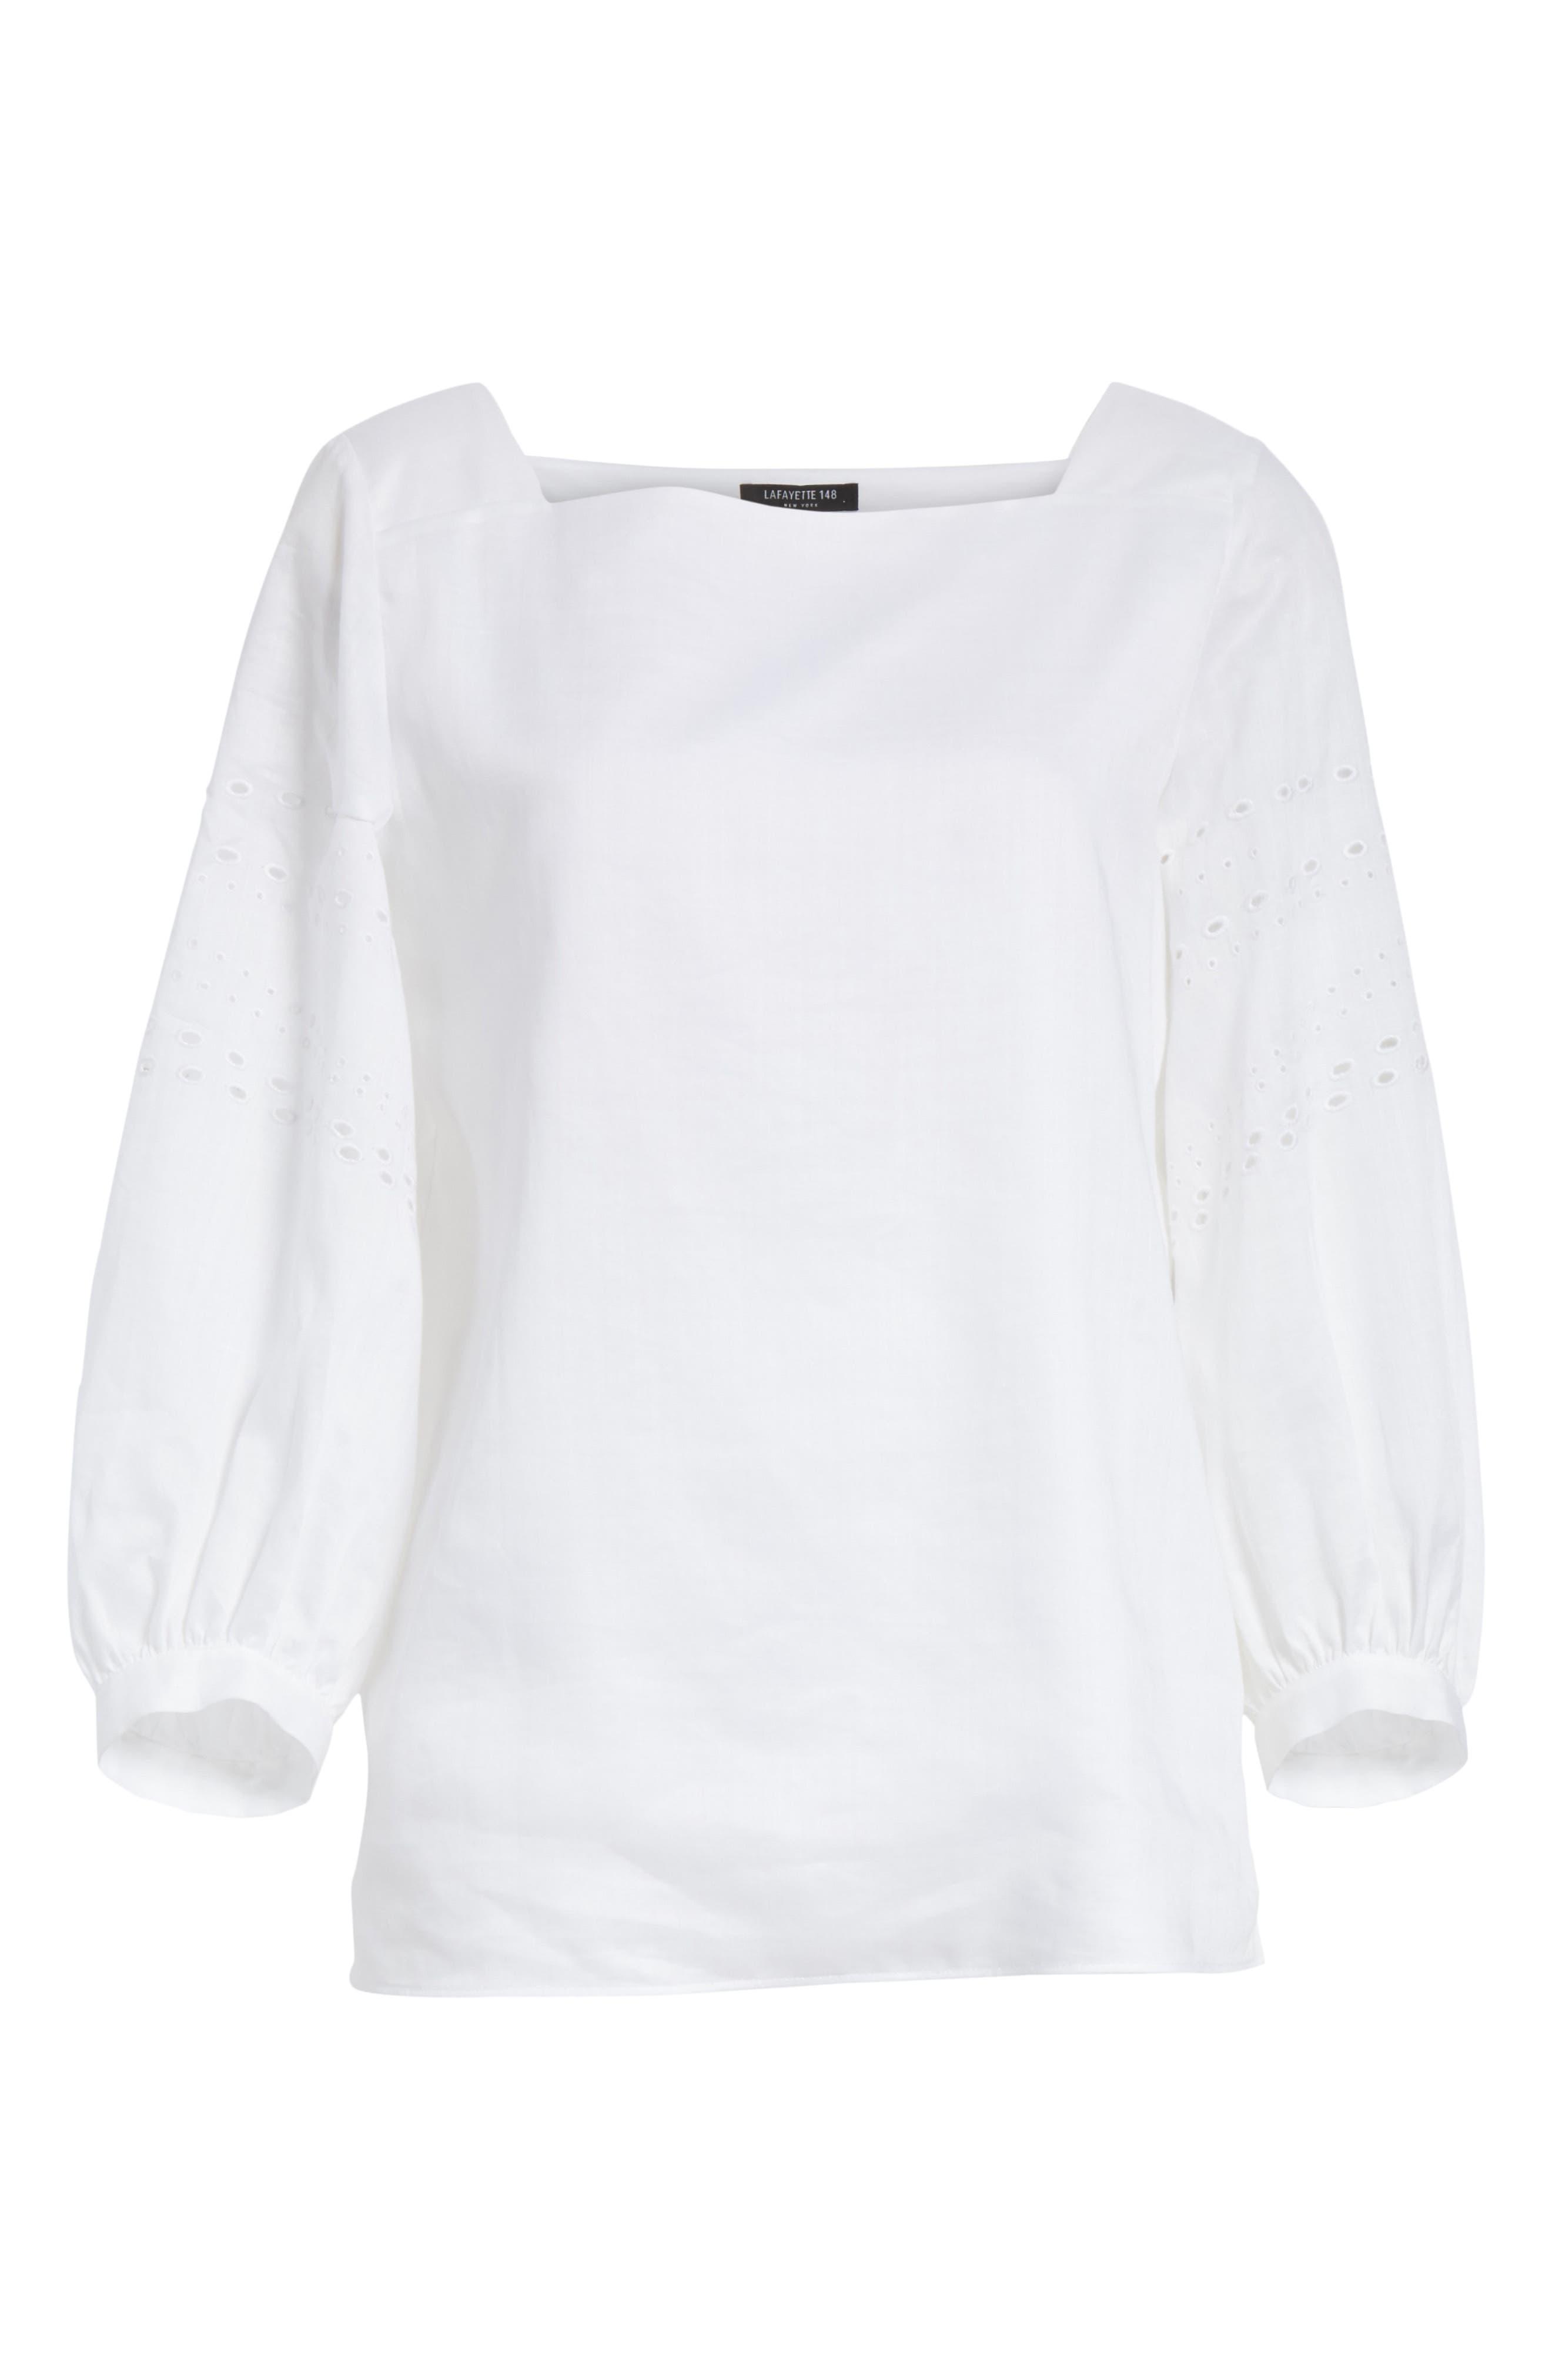 Harper Gemma Cloth Blouse,                             Alternate thumbnail 6, color,                             White